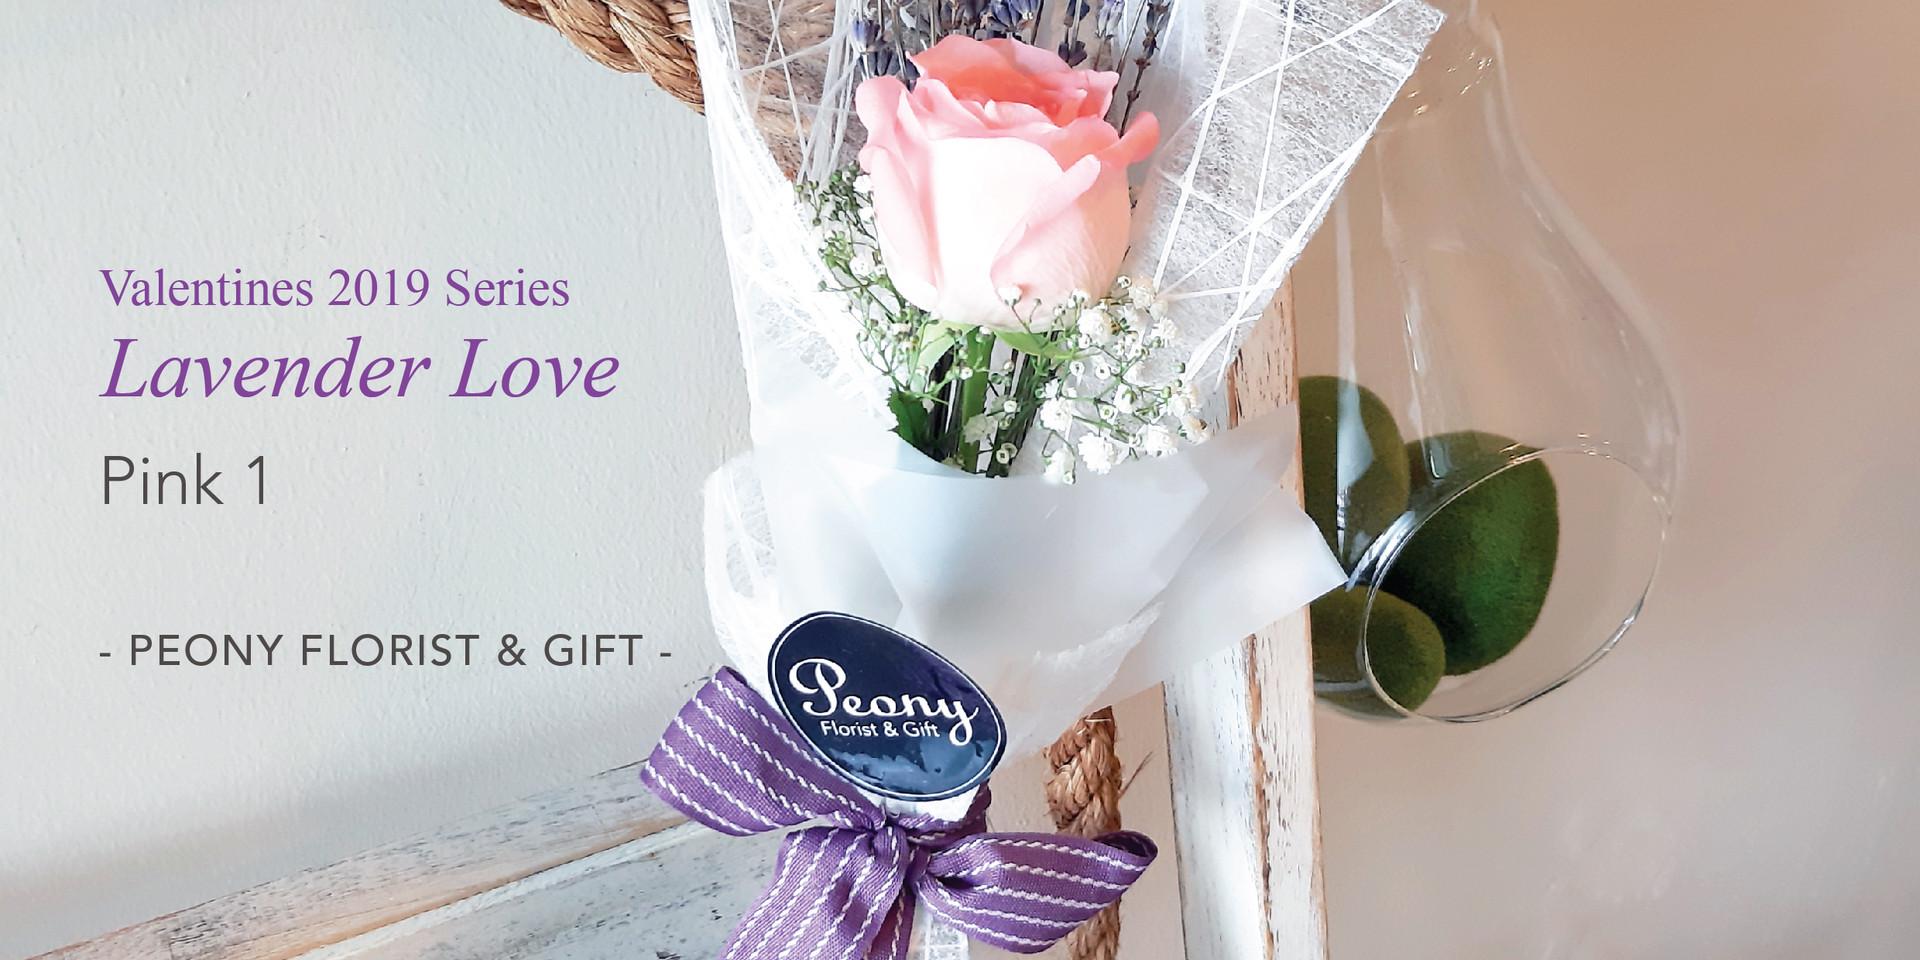 Pink 1-Lavender Love 2019